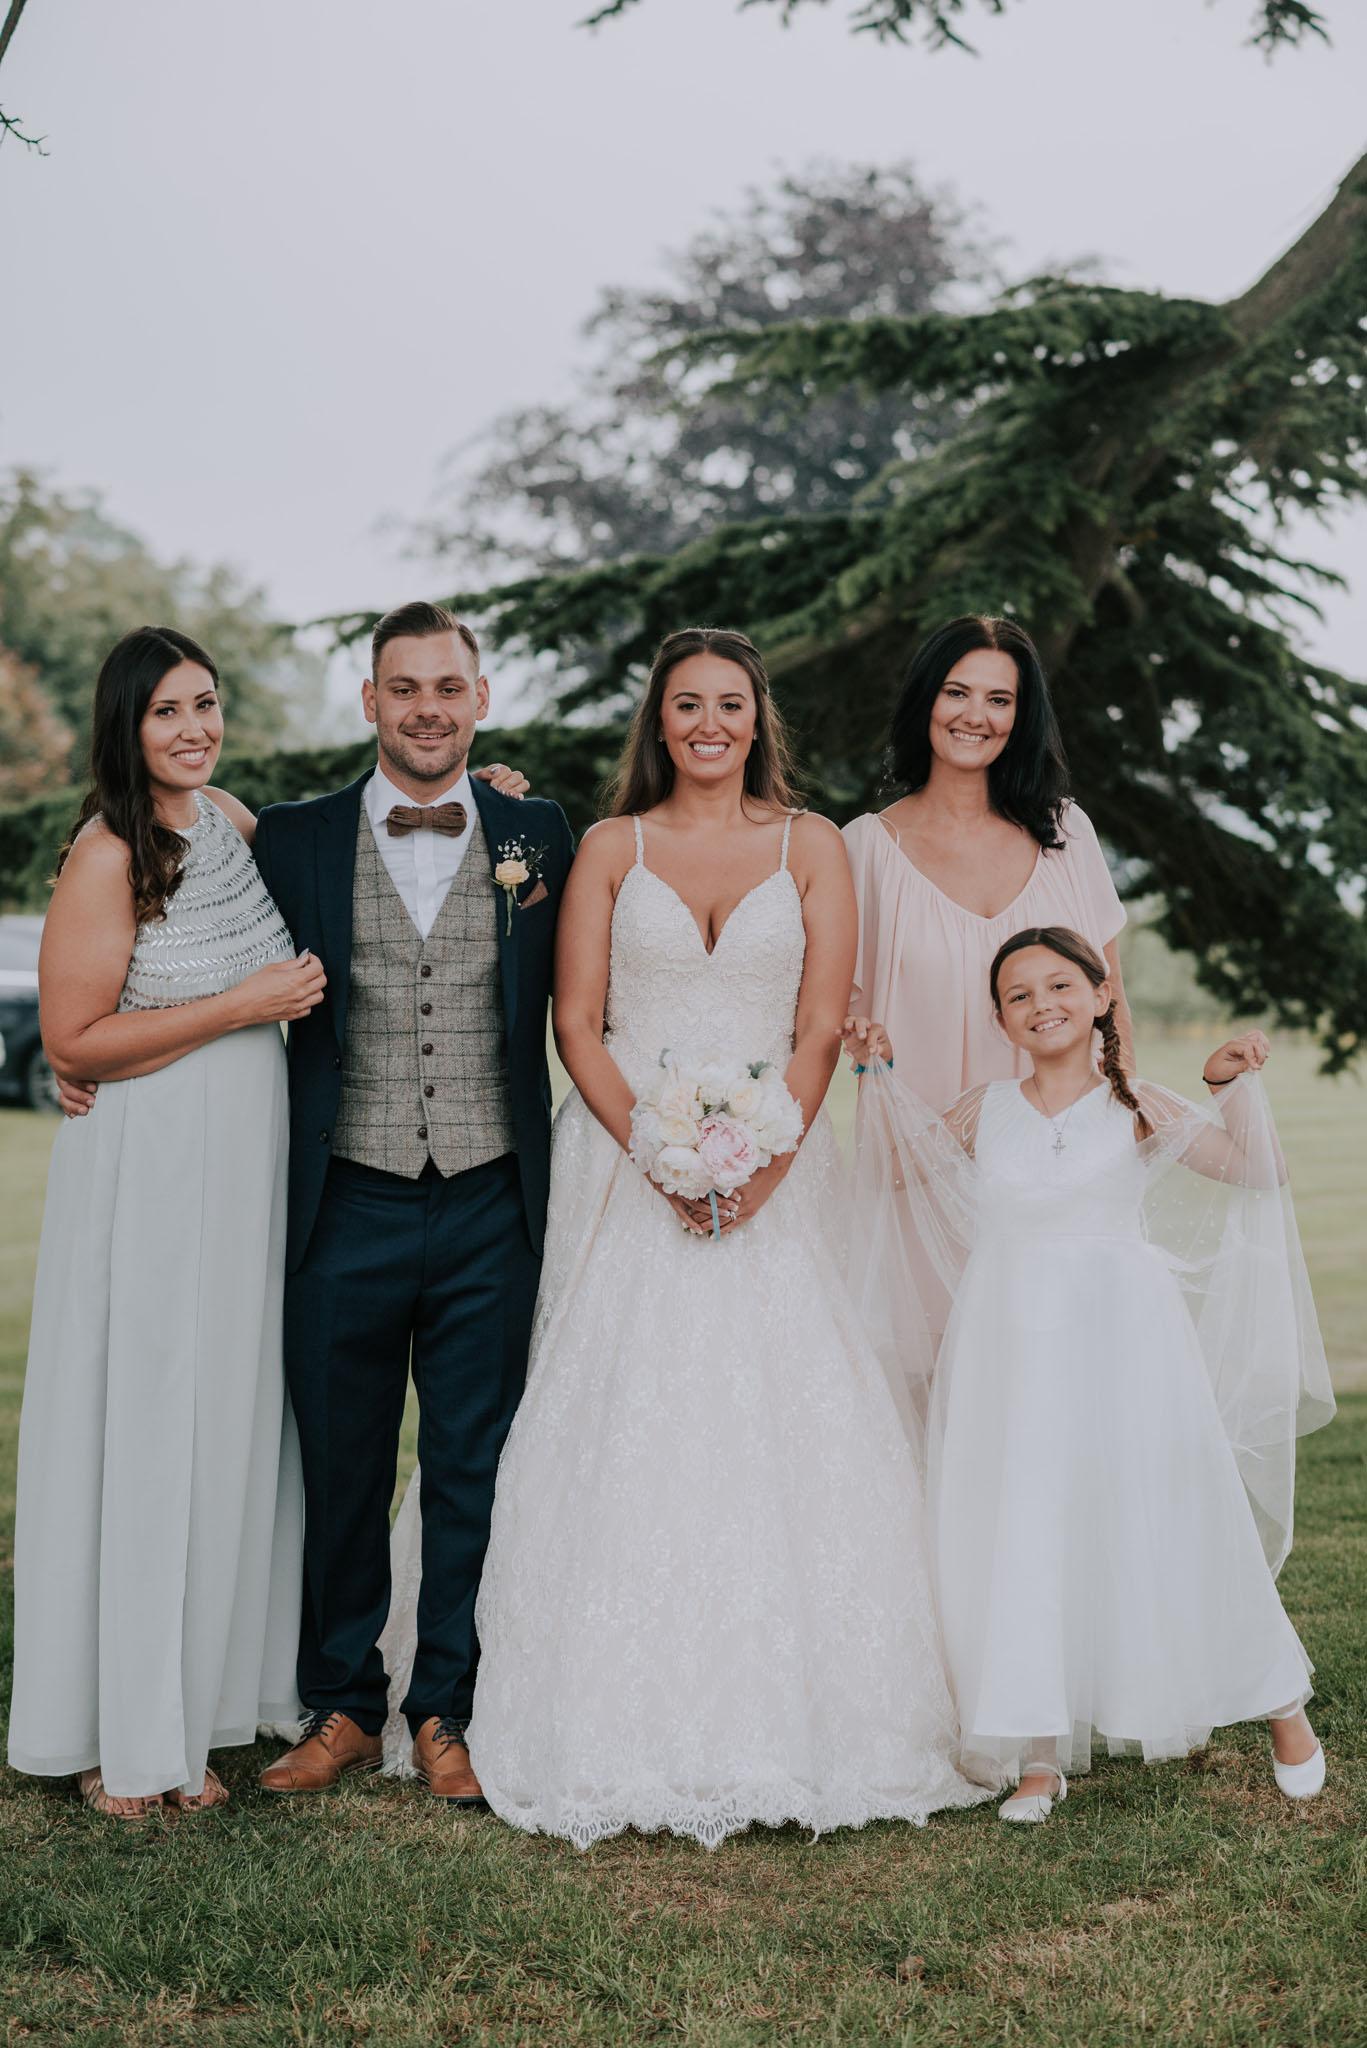 wedding-photographer-glewstone-court-hereford-scott-stockwell-photography342.jpg